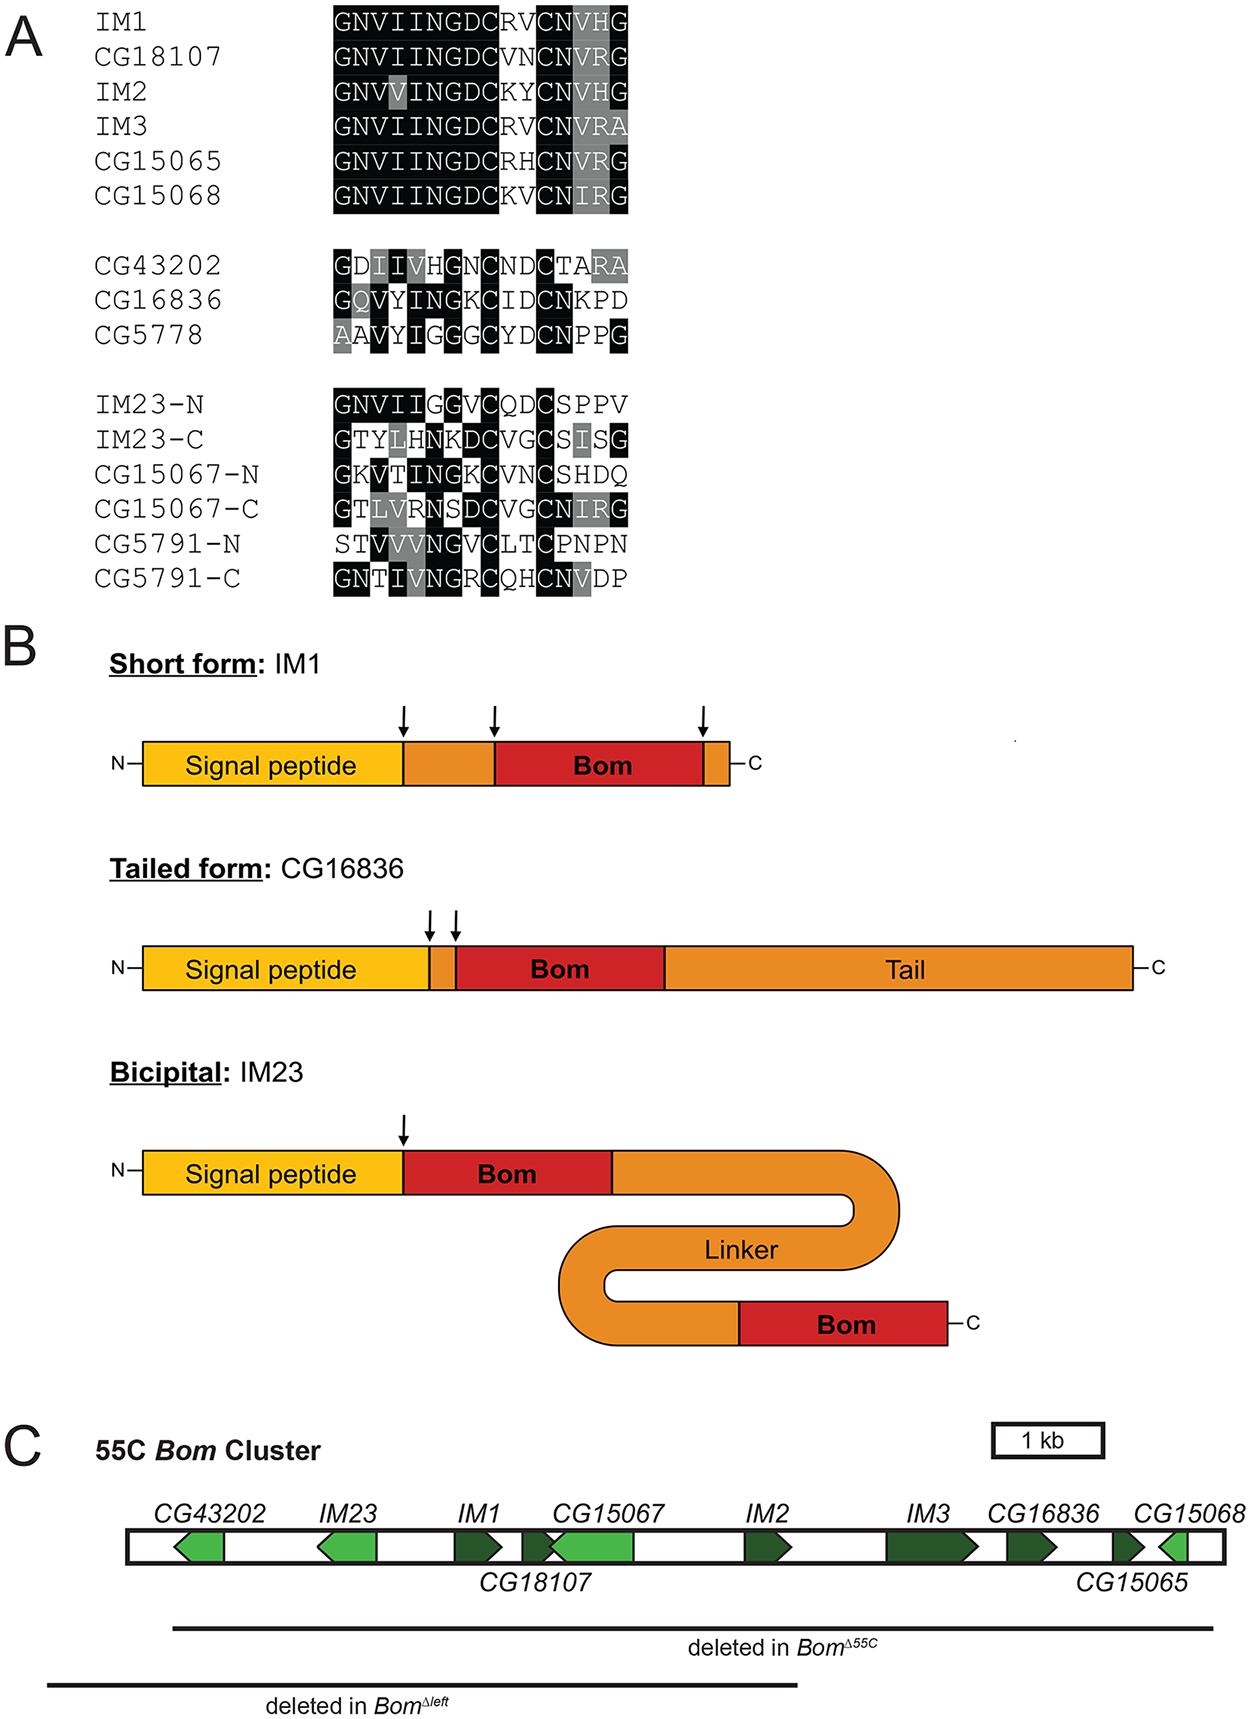 <i>Bom</i> genes share a conserved 16-aa motif.